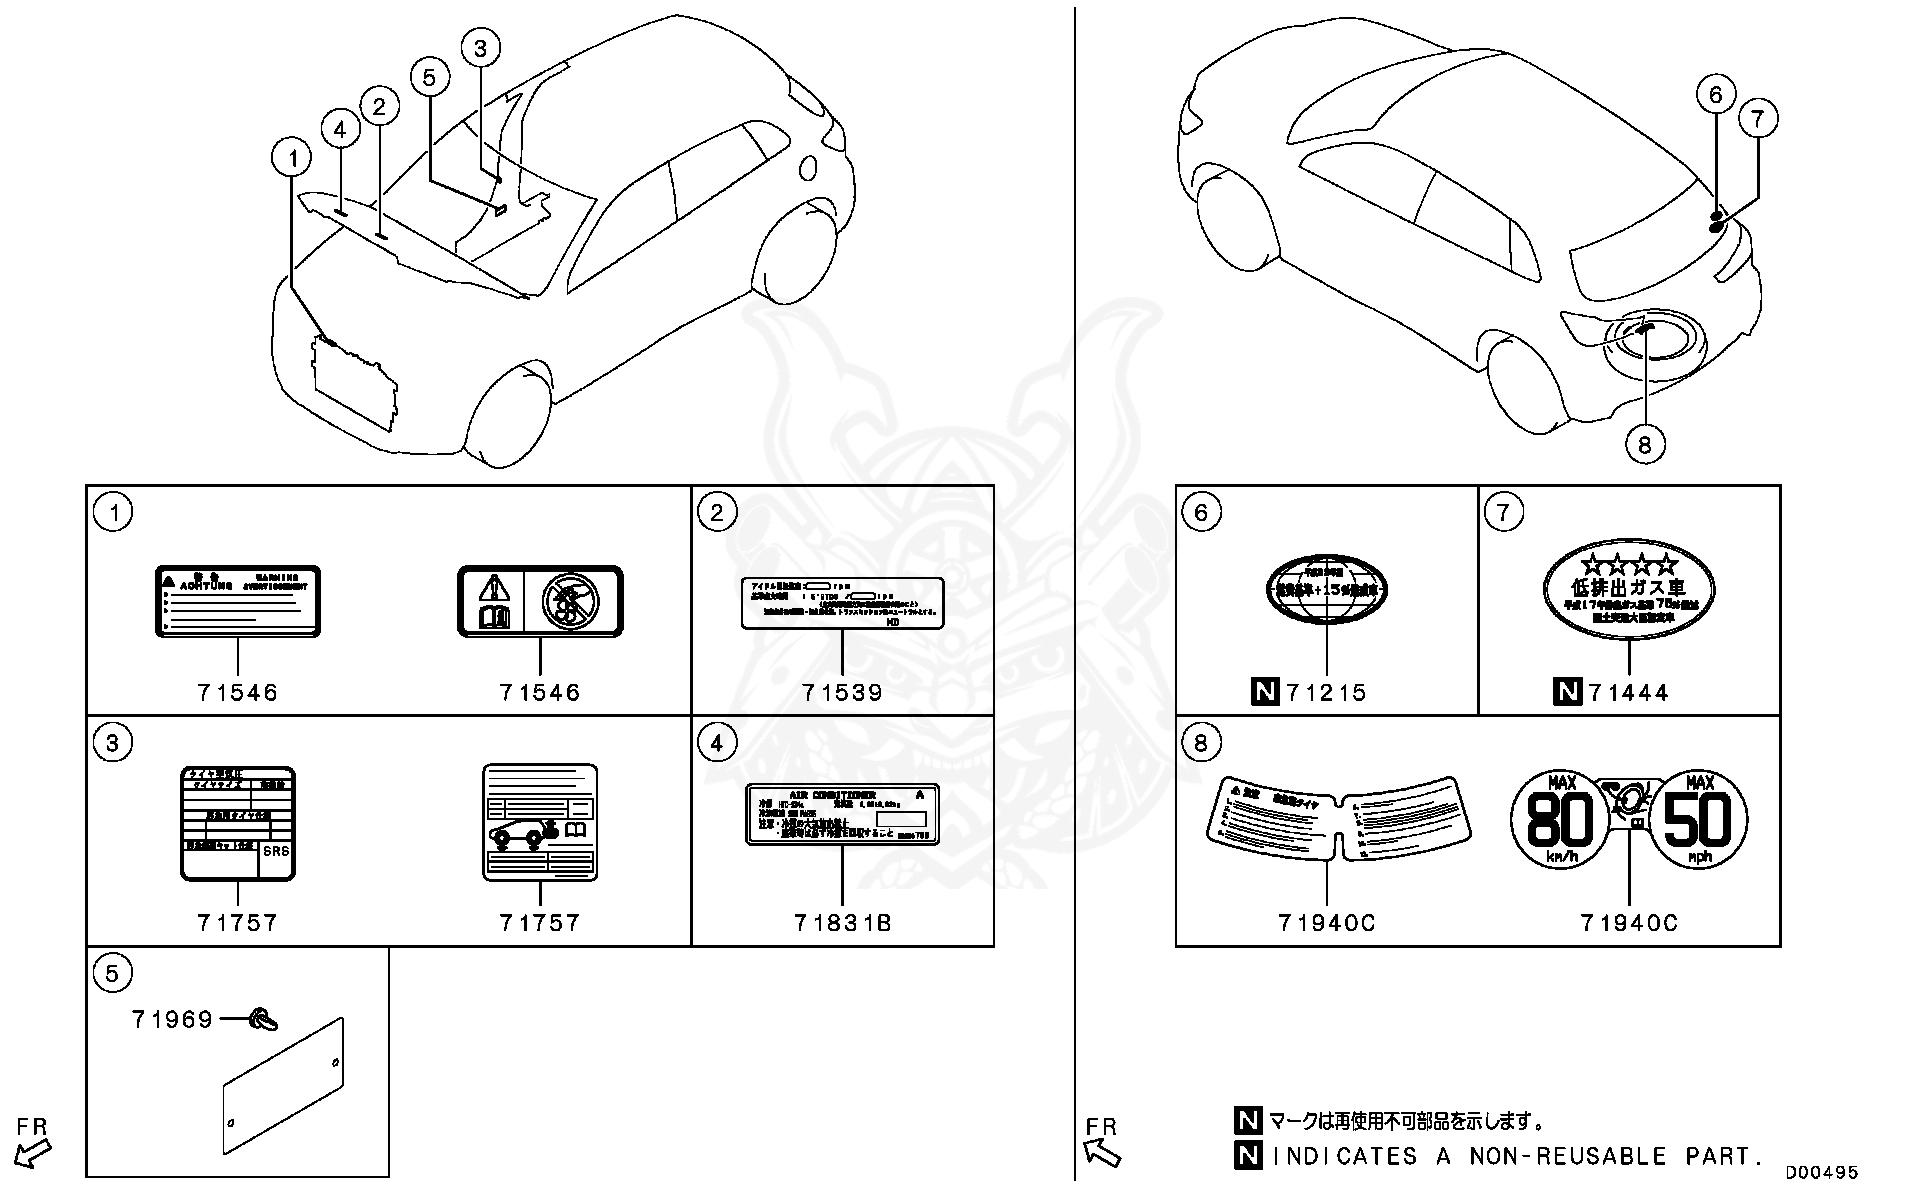 Mitsubishi - Label, Low Emission